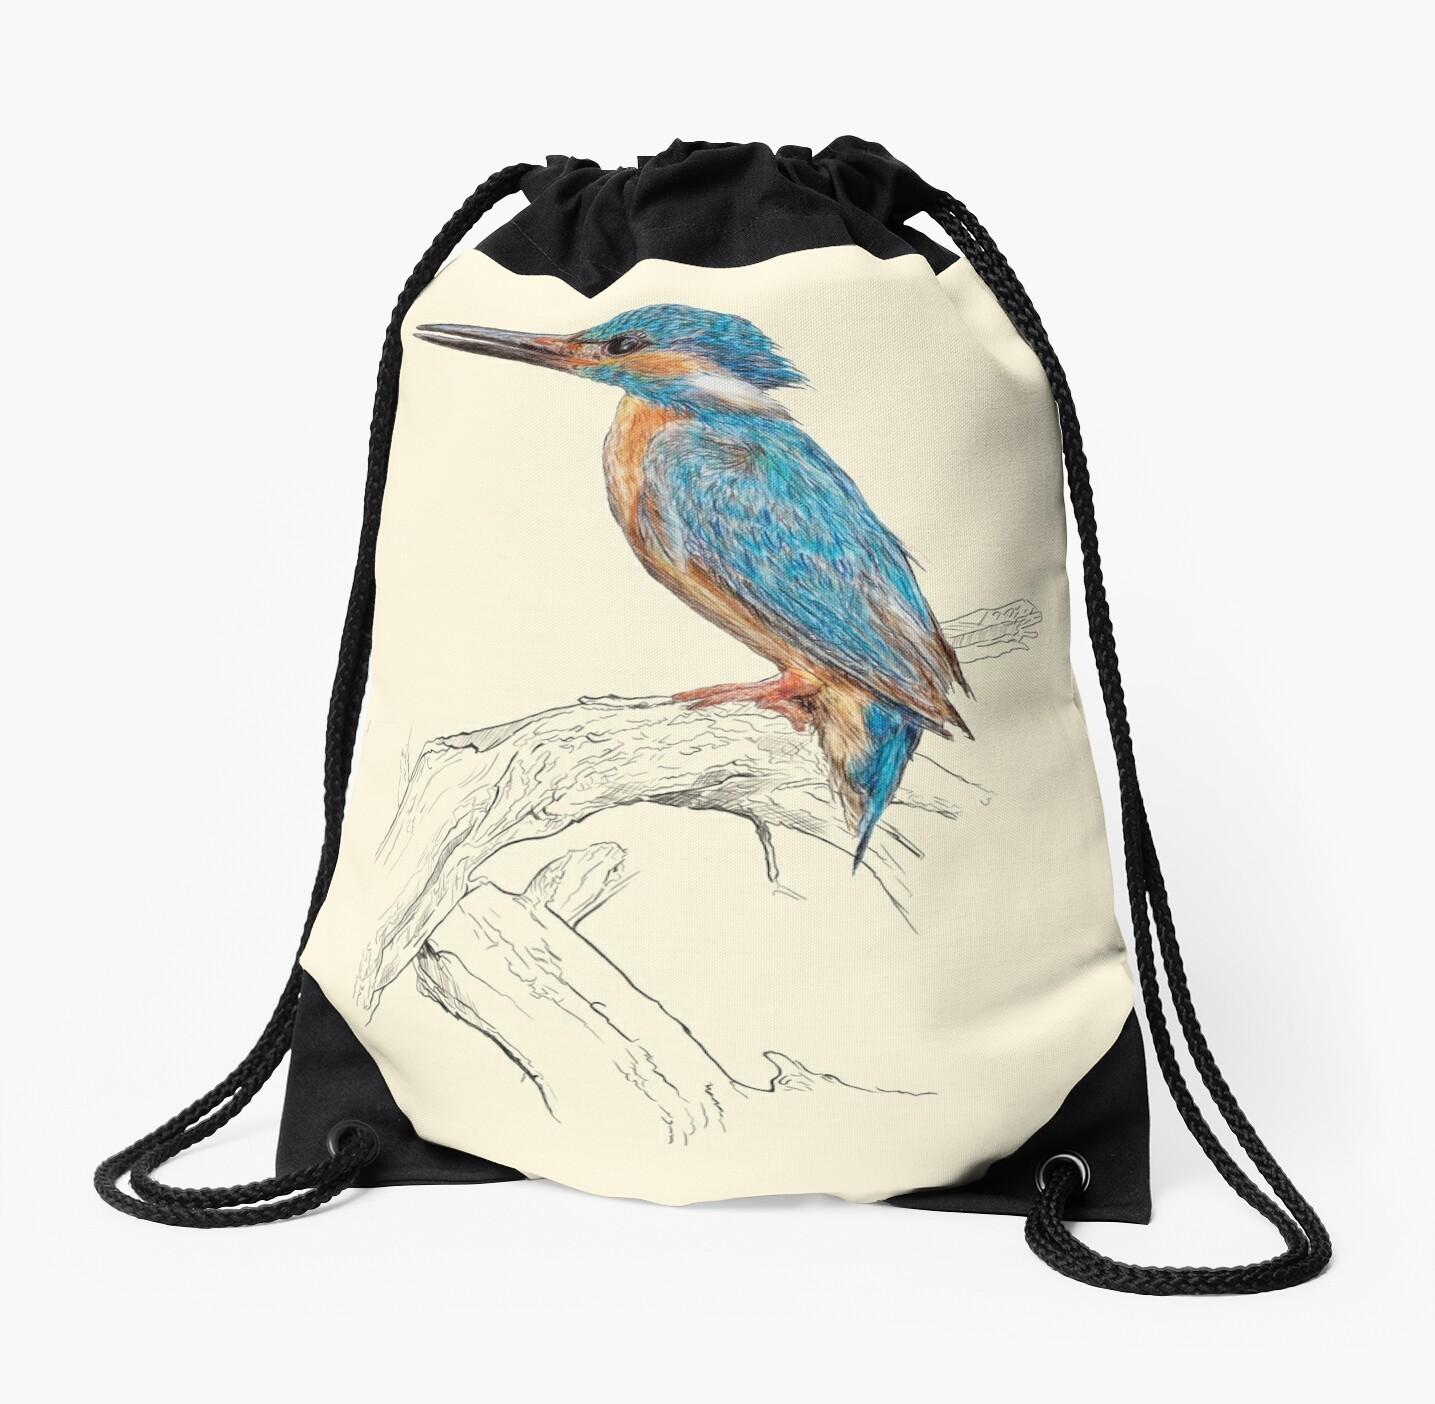 Kingfisher by Bianca Elena Cudalbu